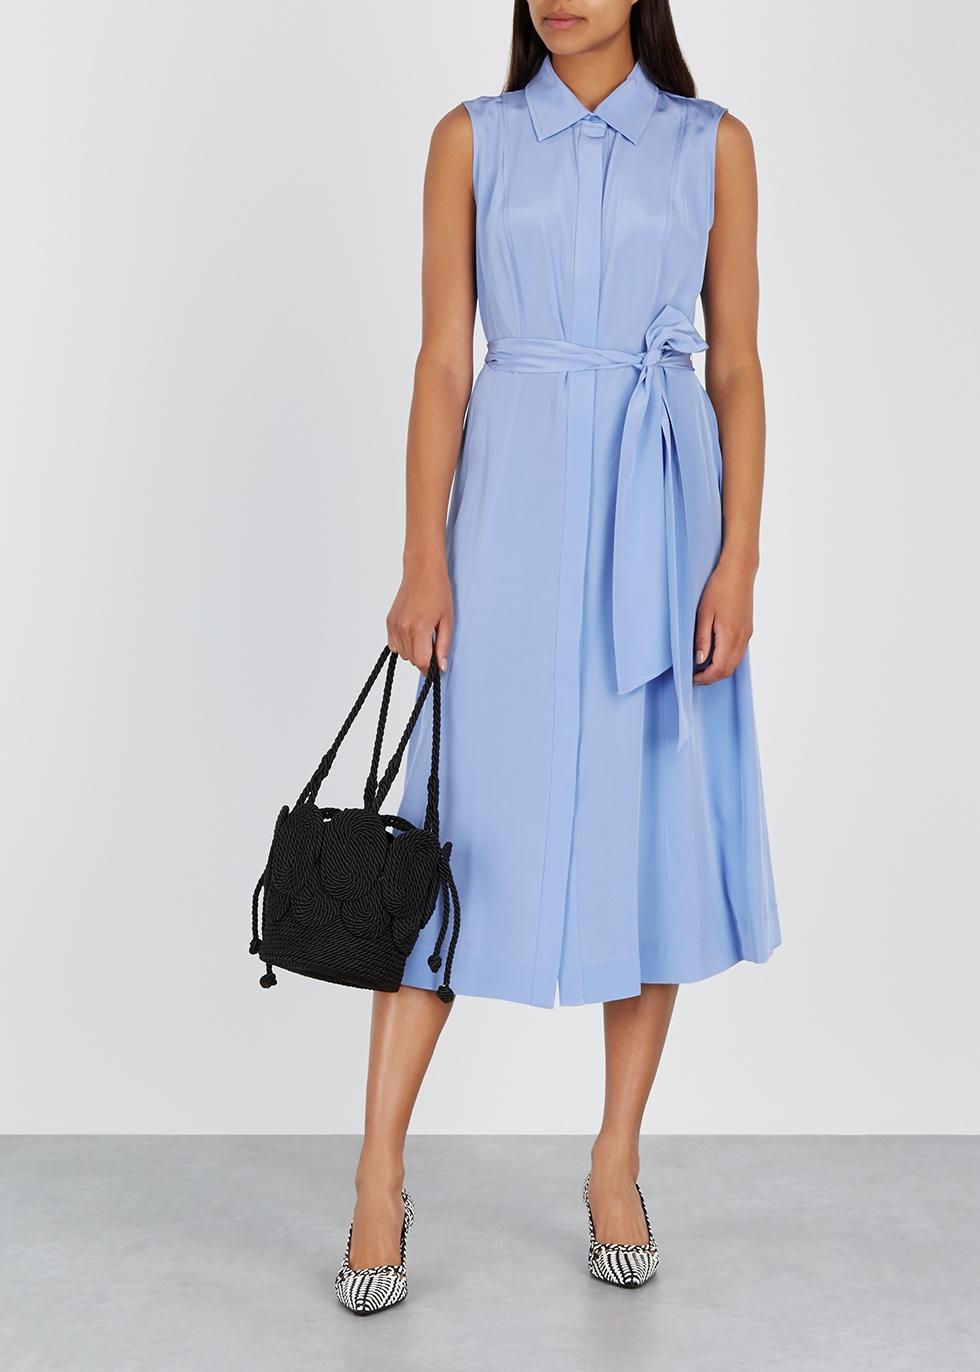 bcc2a93ca4 Diane von Furstenberg Dresses